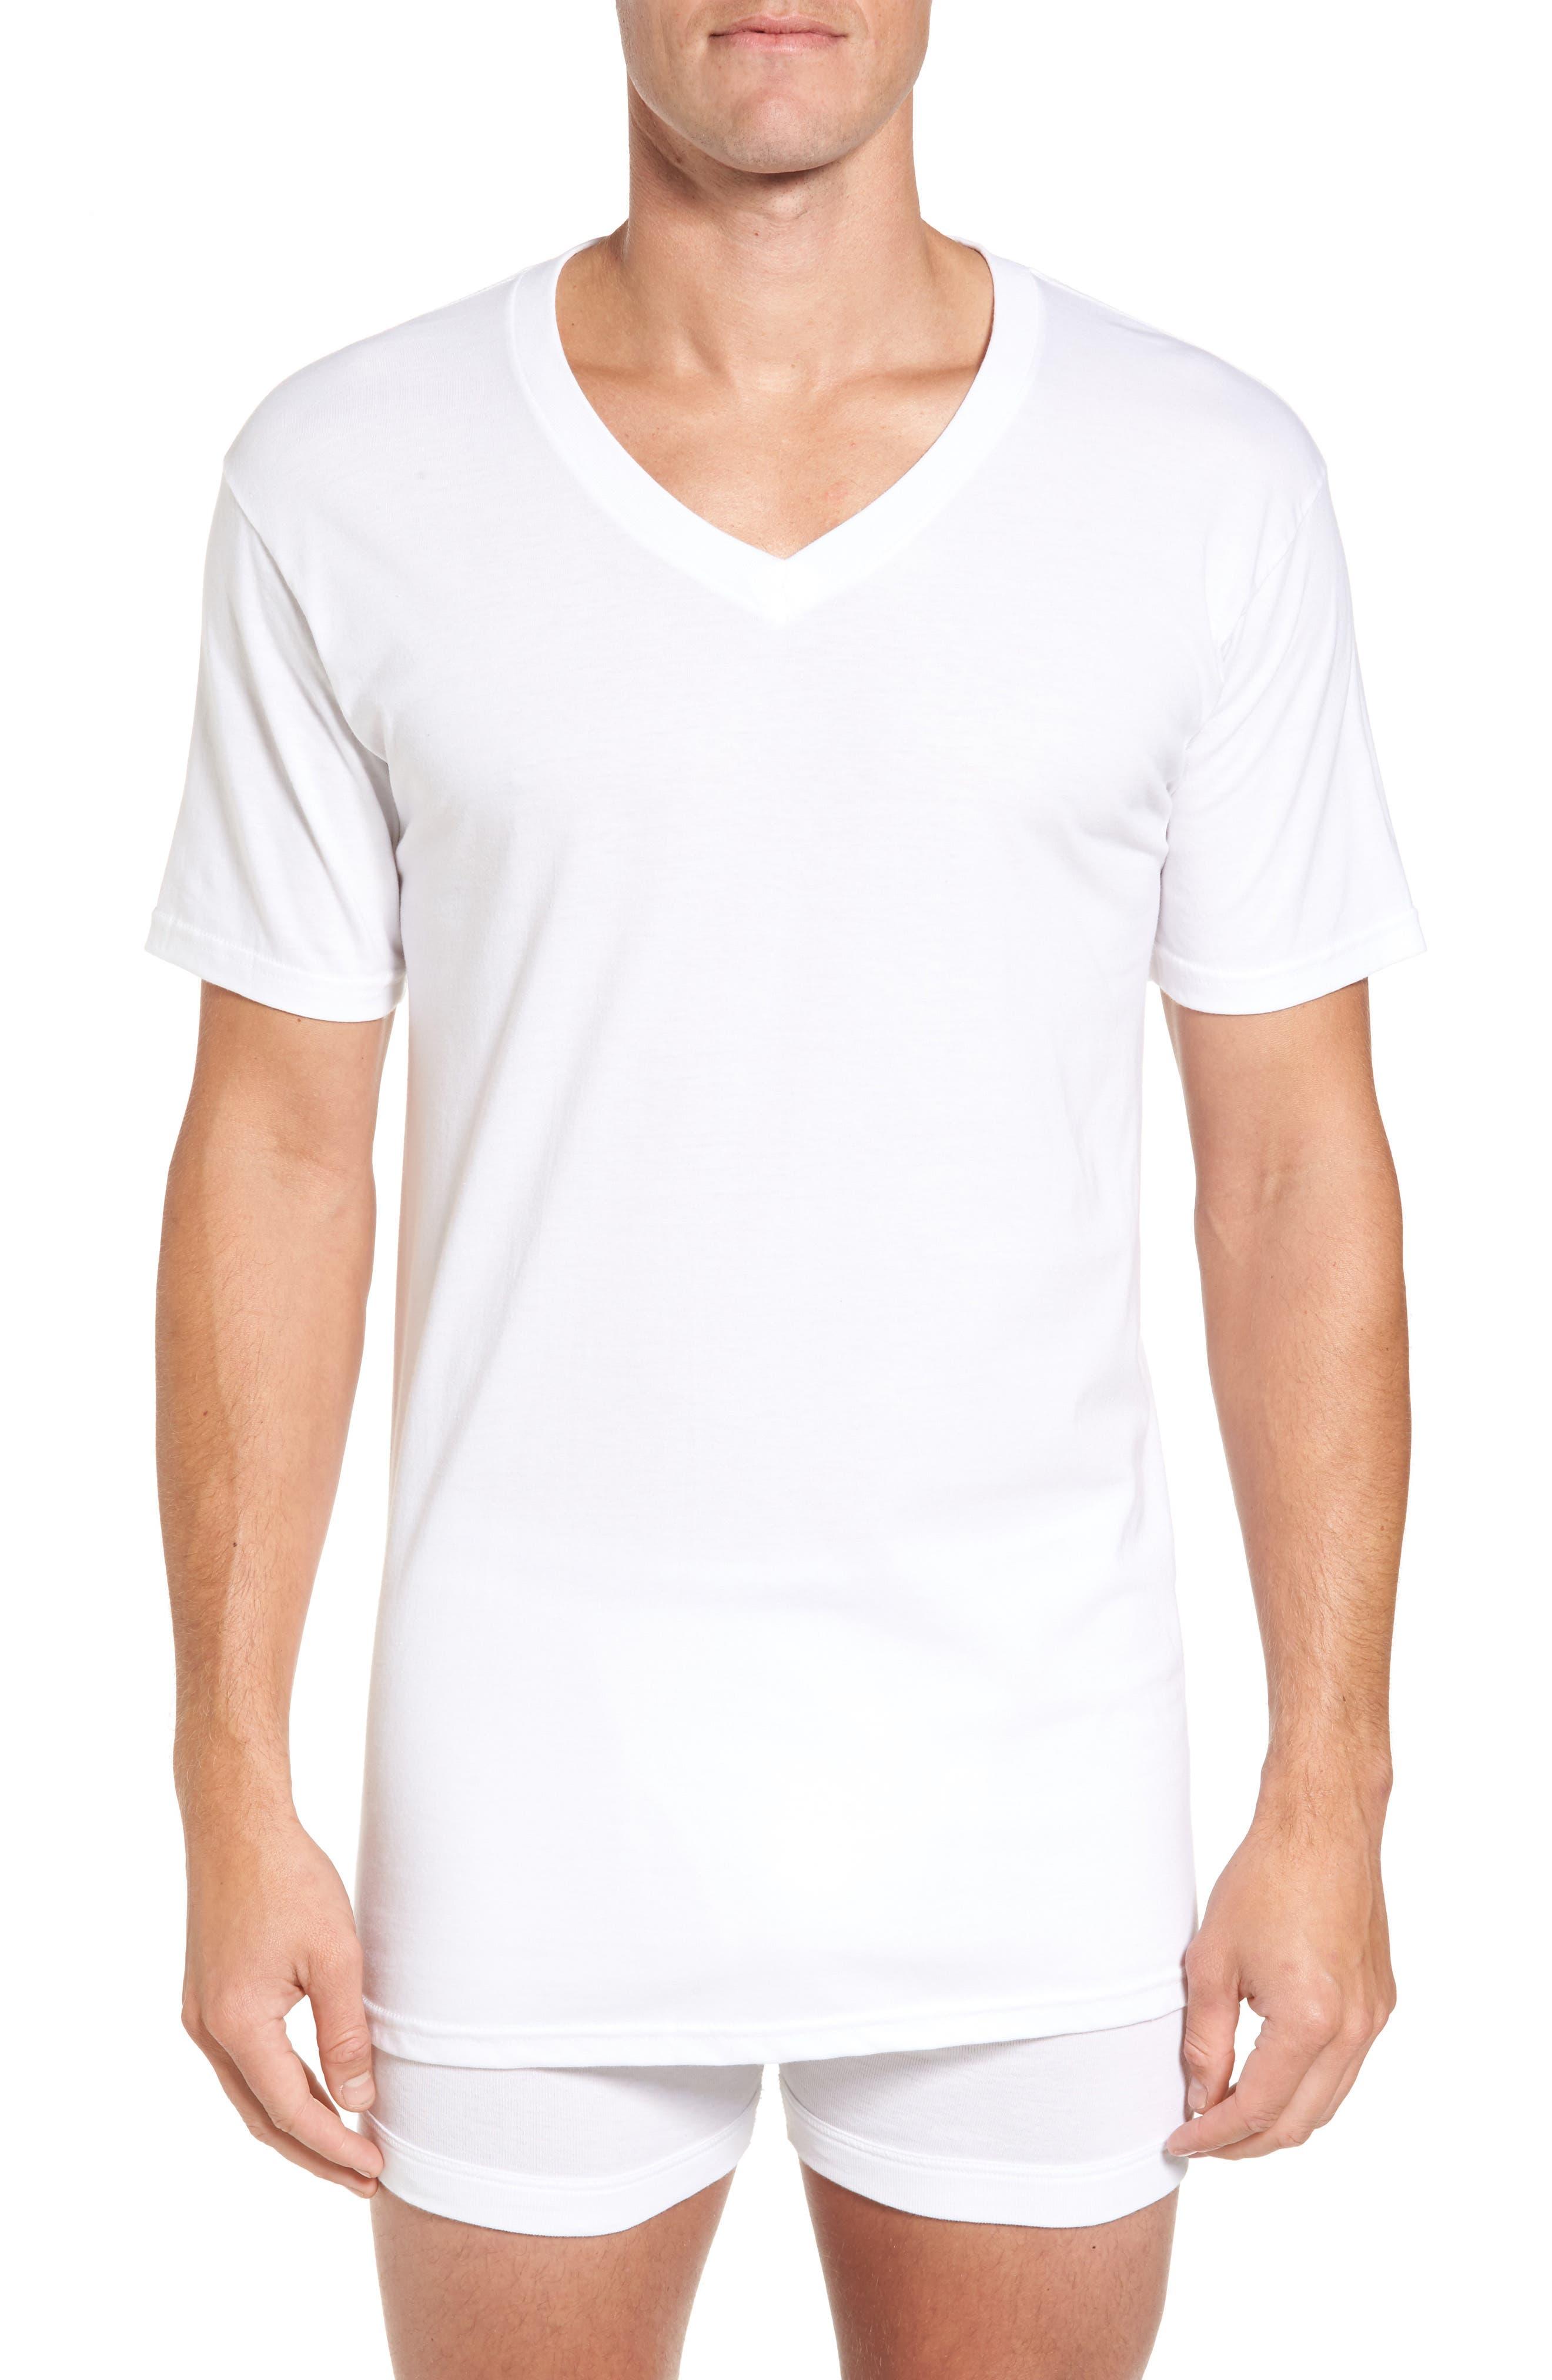 NORDSTROM MEN'S SHOP, 4-Pack Regular Fit Supima<sup>®</sup> Cotton V-Neck T-Shirts, Main thumbnail 1, color, WHITE